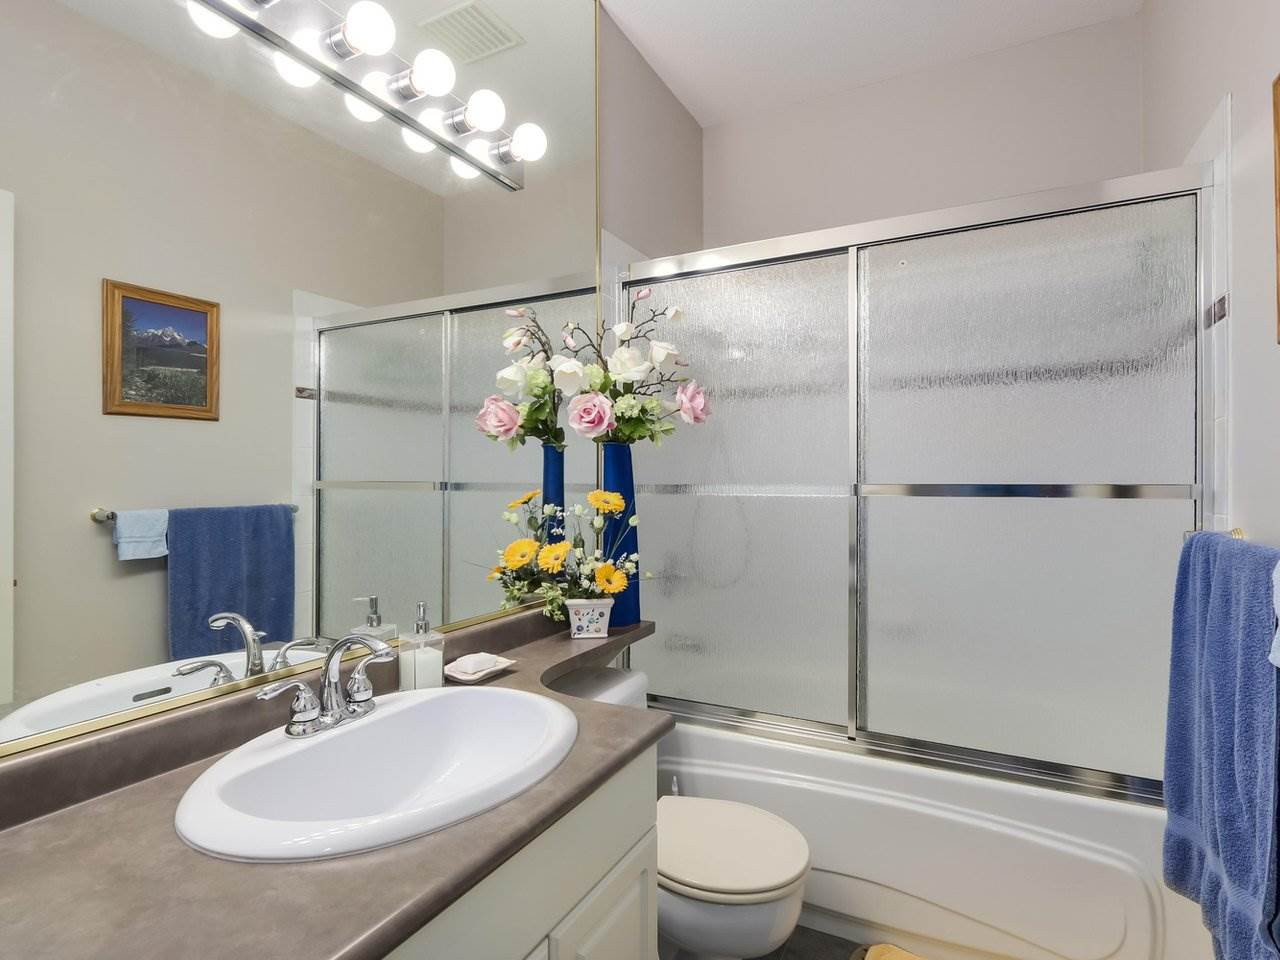 Photo 15: Photos: 303 3280 PLATEAU BOULEVARD in Coquitlam: Westwood Plateau Condo for sale : MLS®# R2275918